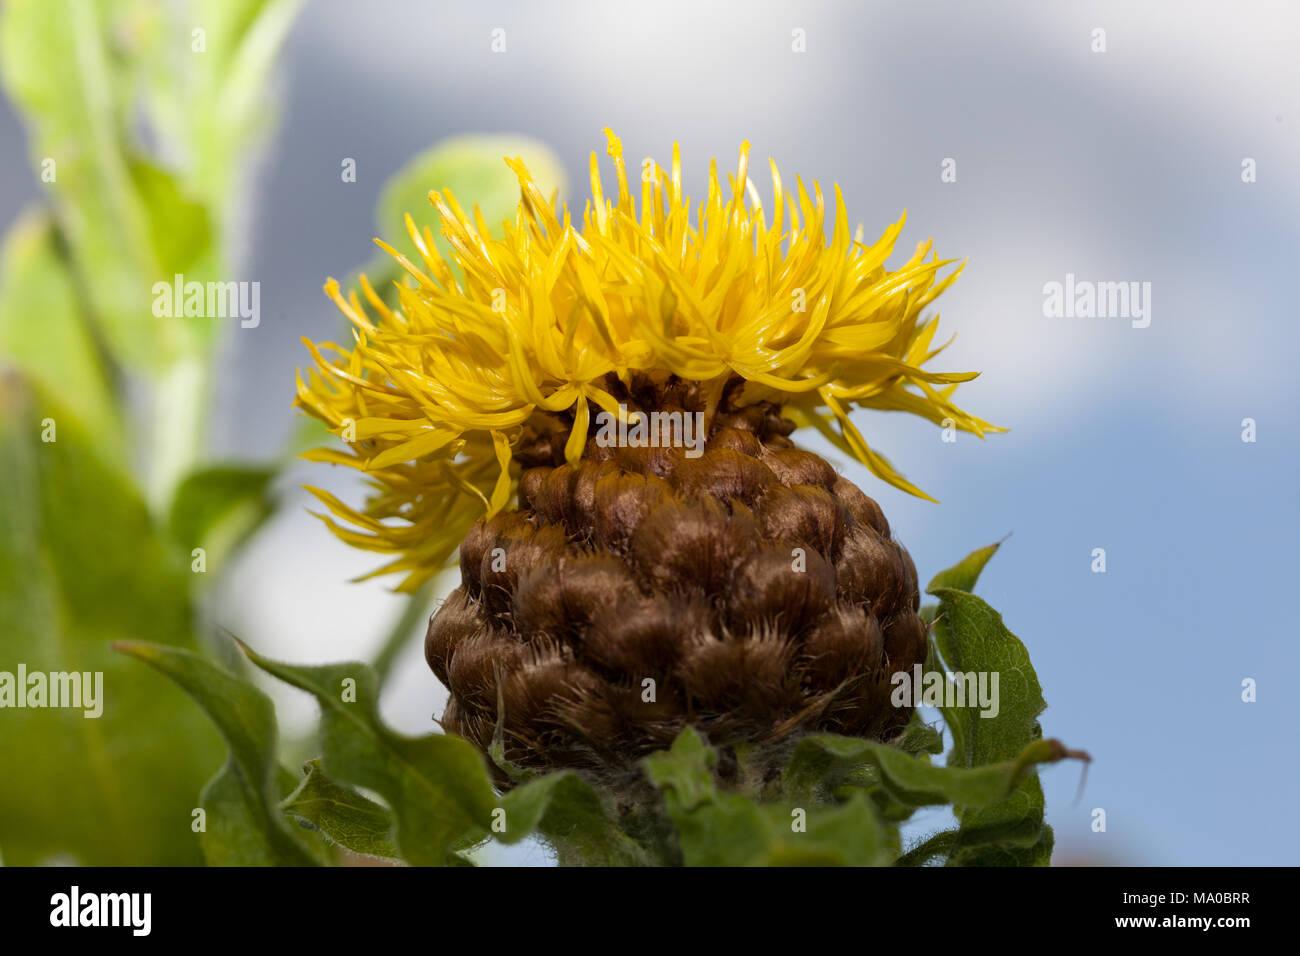 Bighead Fiordaliso, Gulklint (Centaurea macrocephala) Immagini Stock